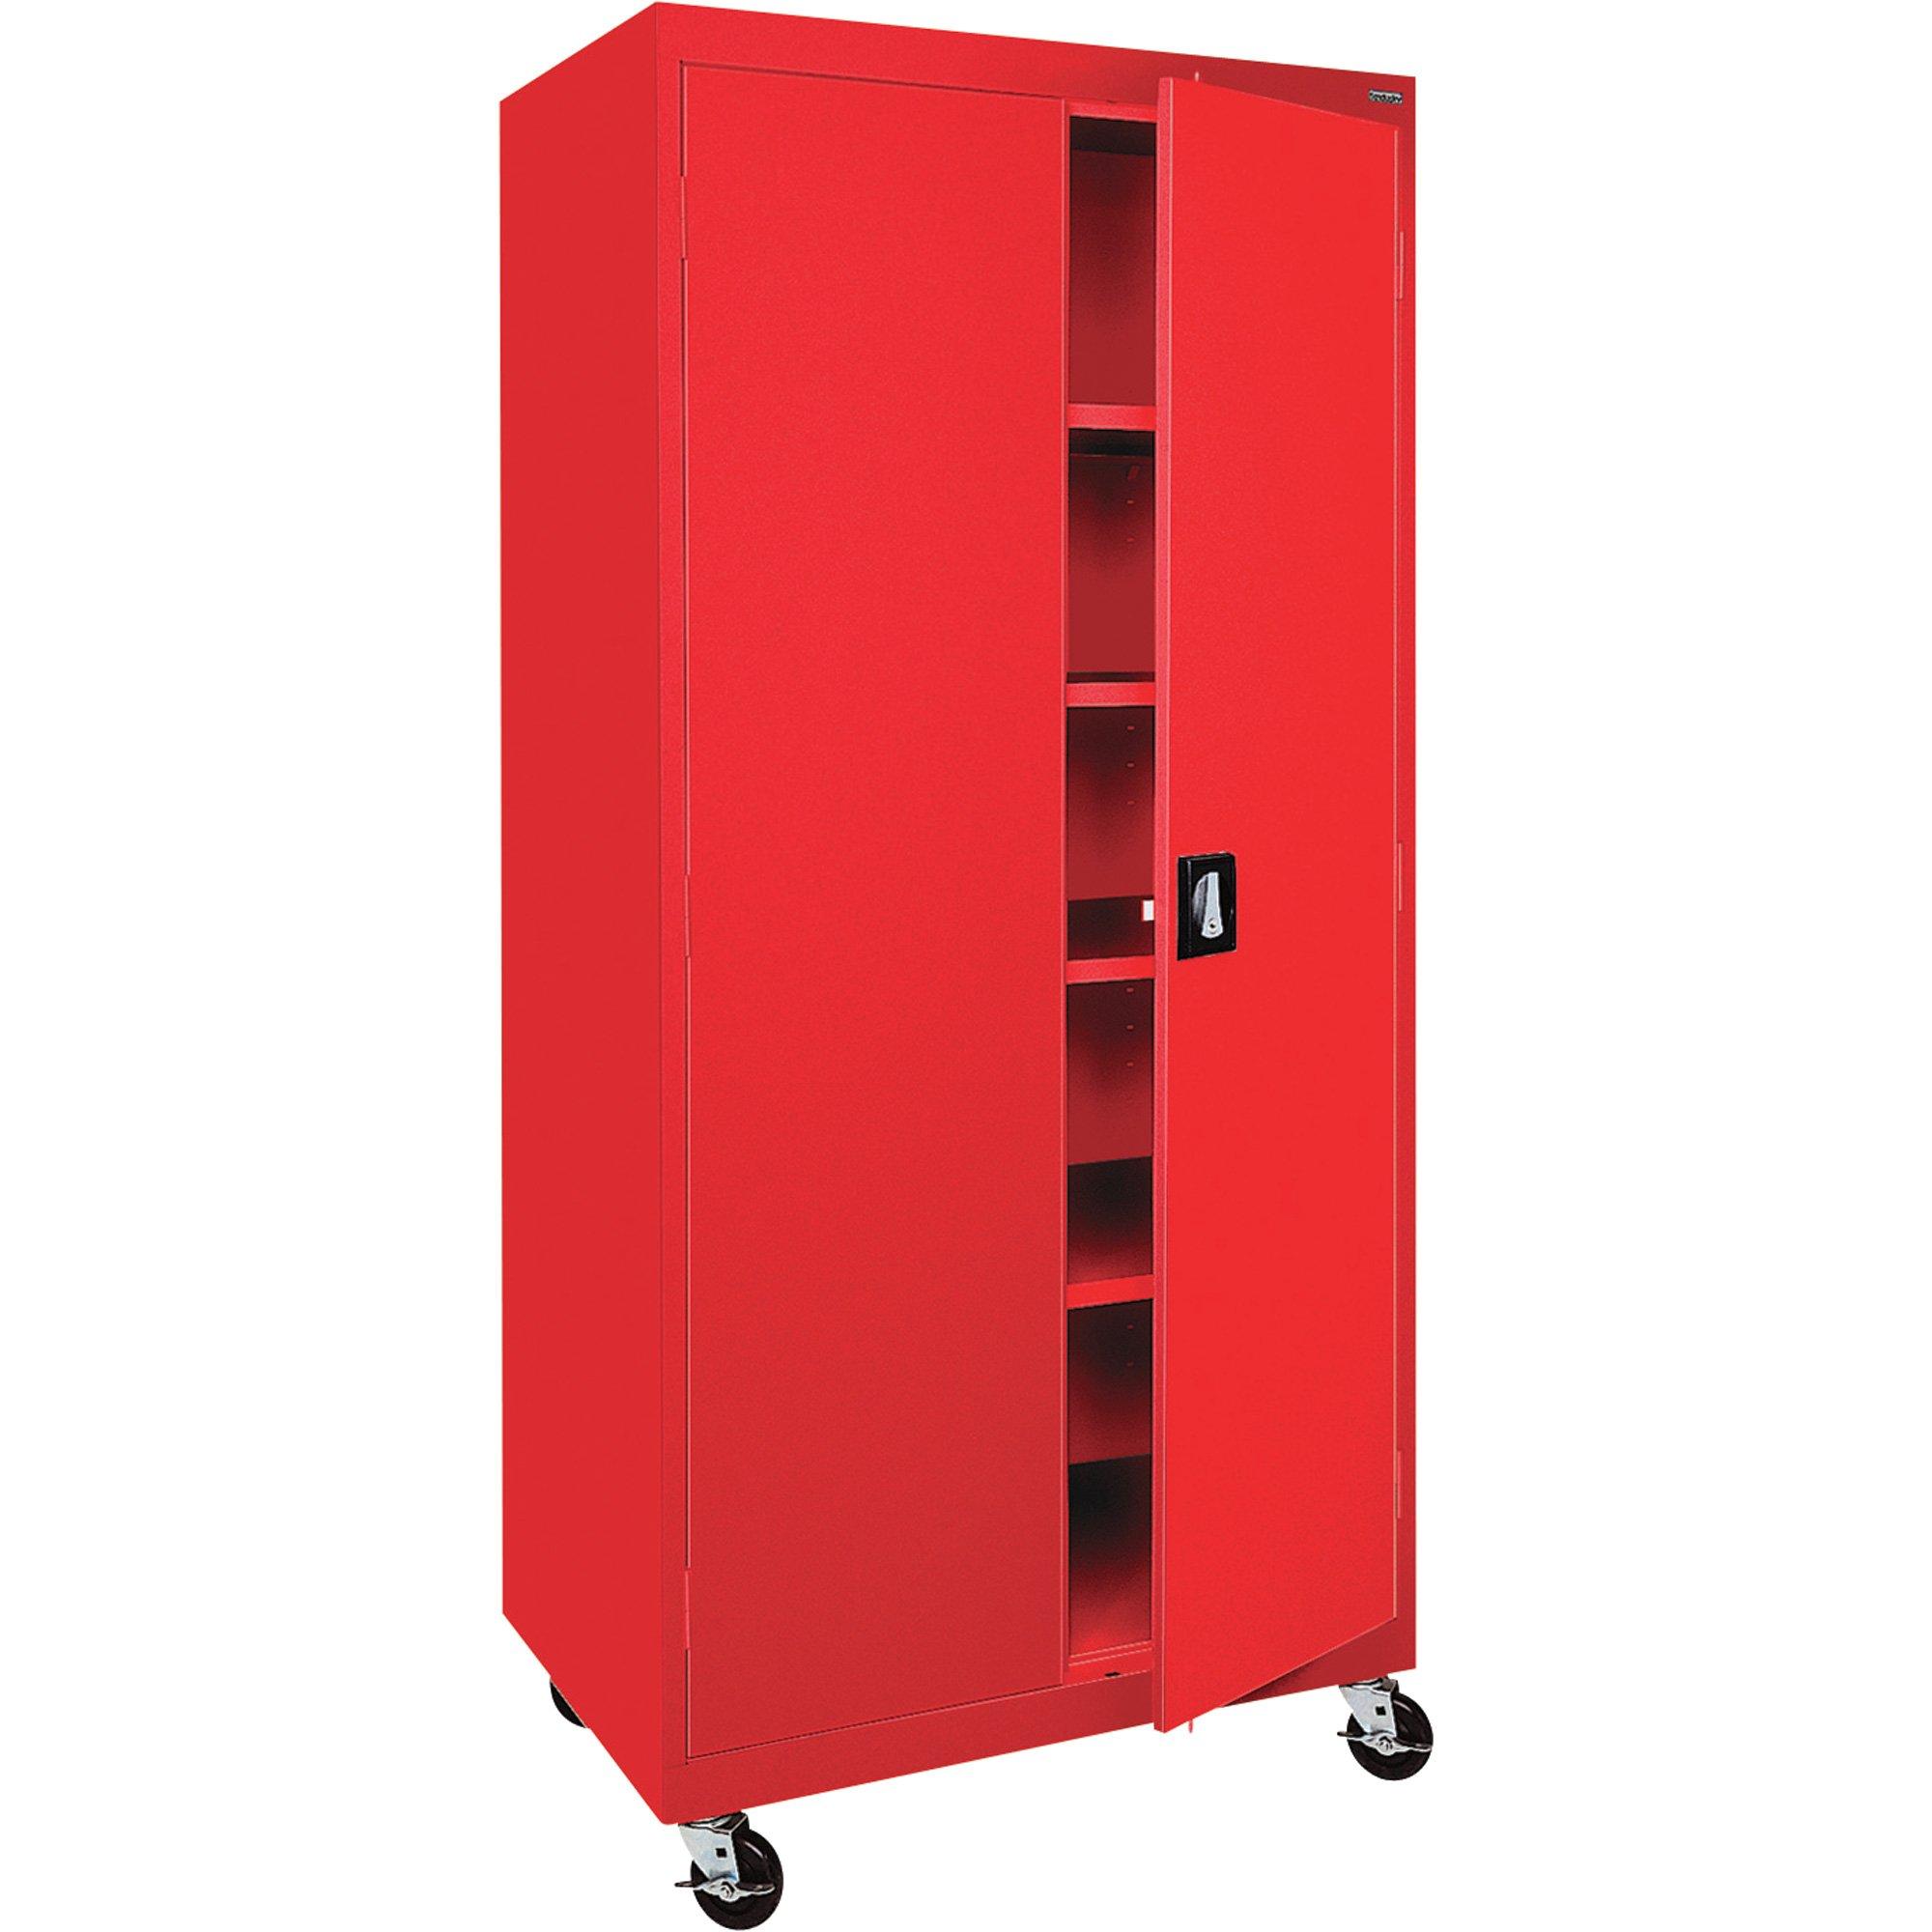 Sandusky Lee TA4R302466-01 Transport Series Mobile Storage Cabinet, Red